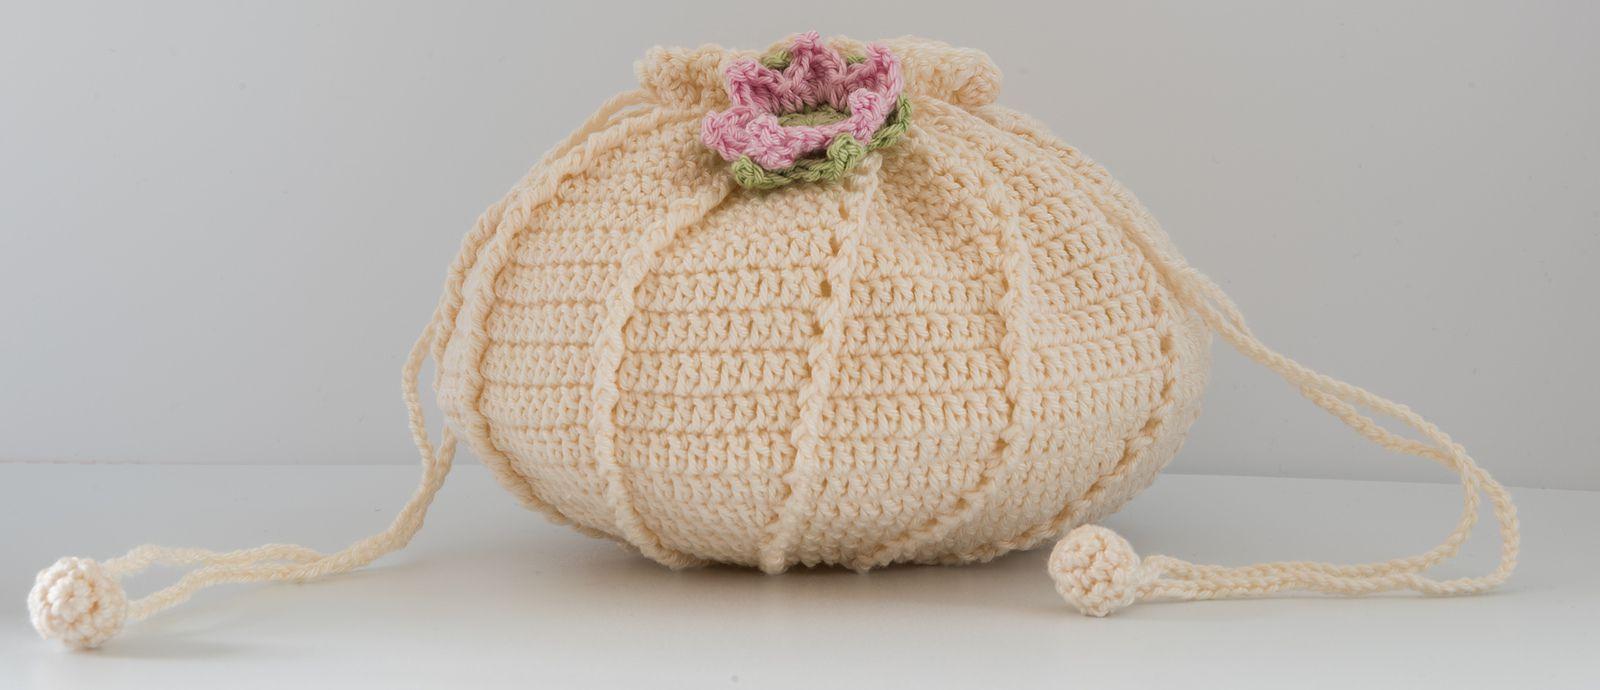 8 Creative Crochet Bag Patterns